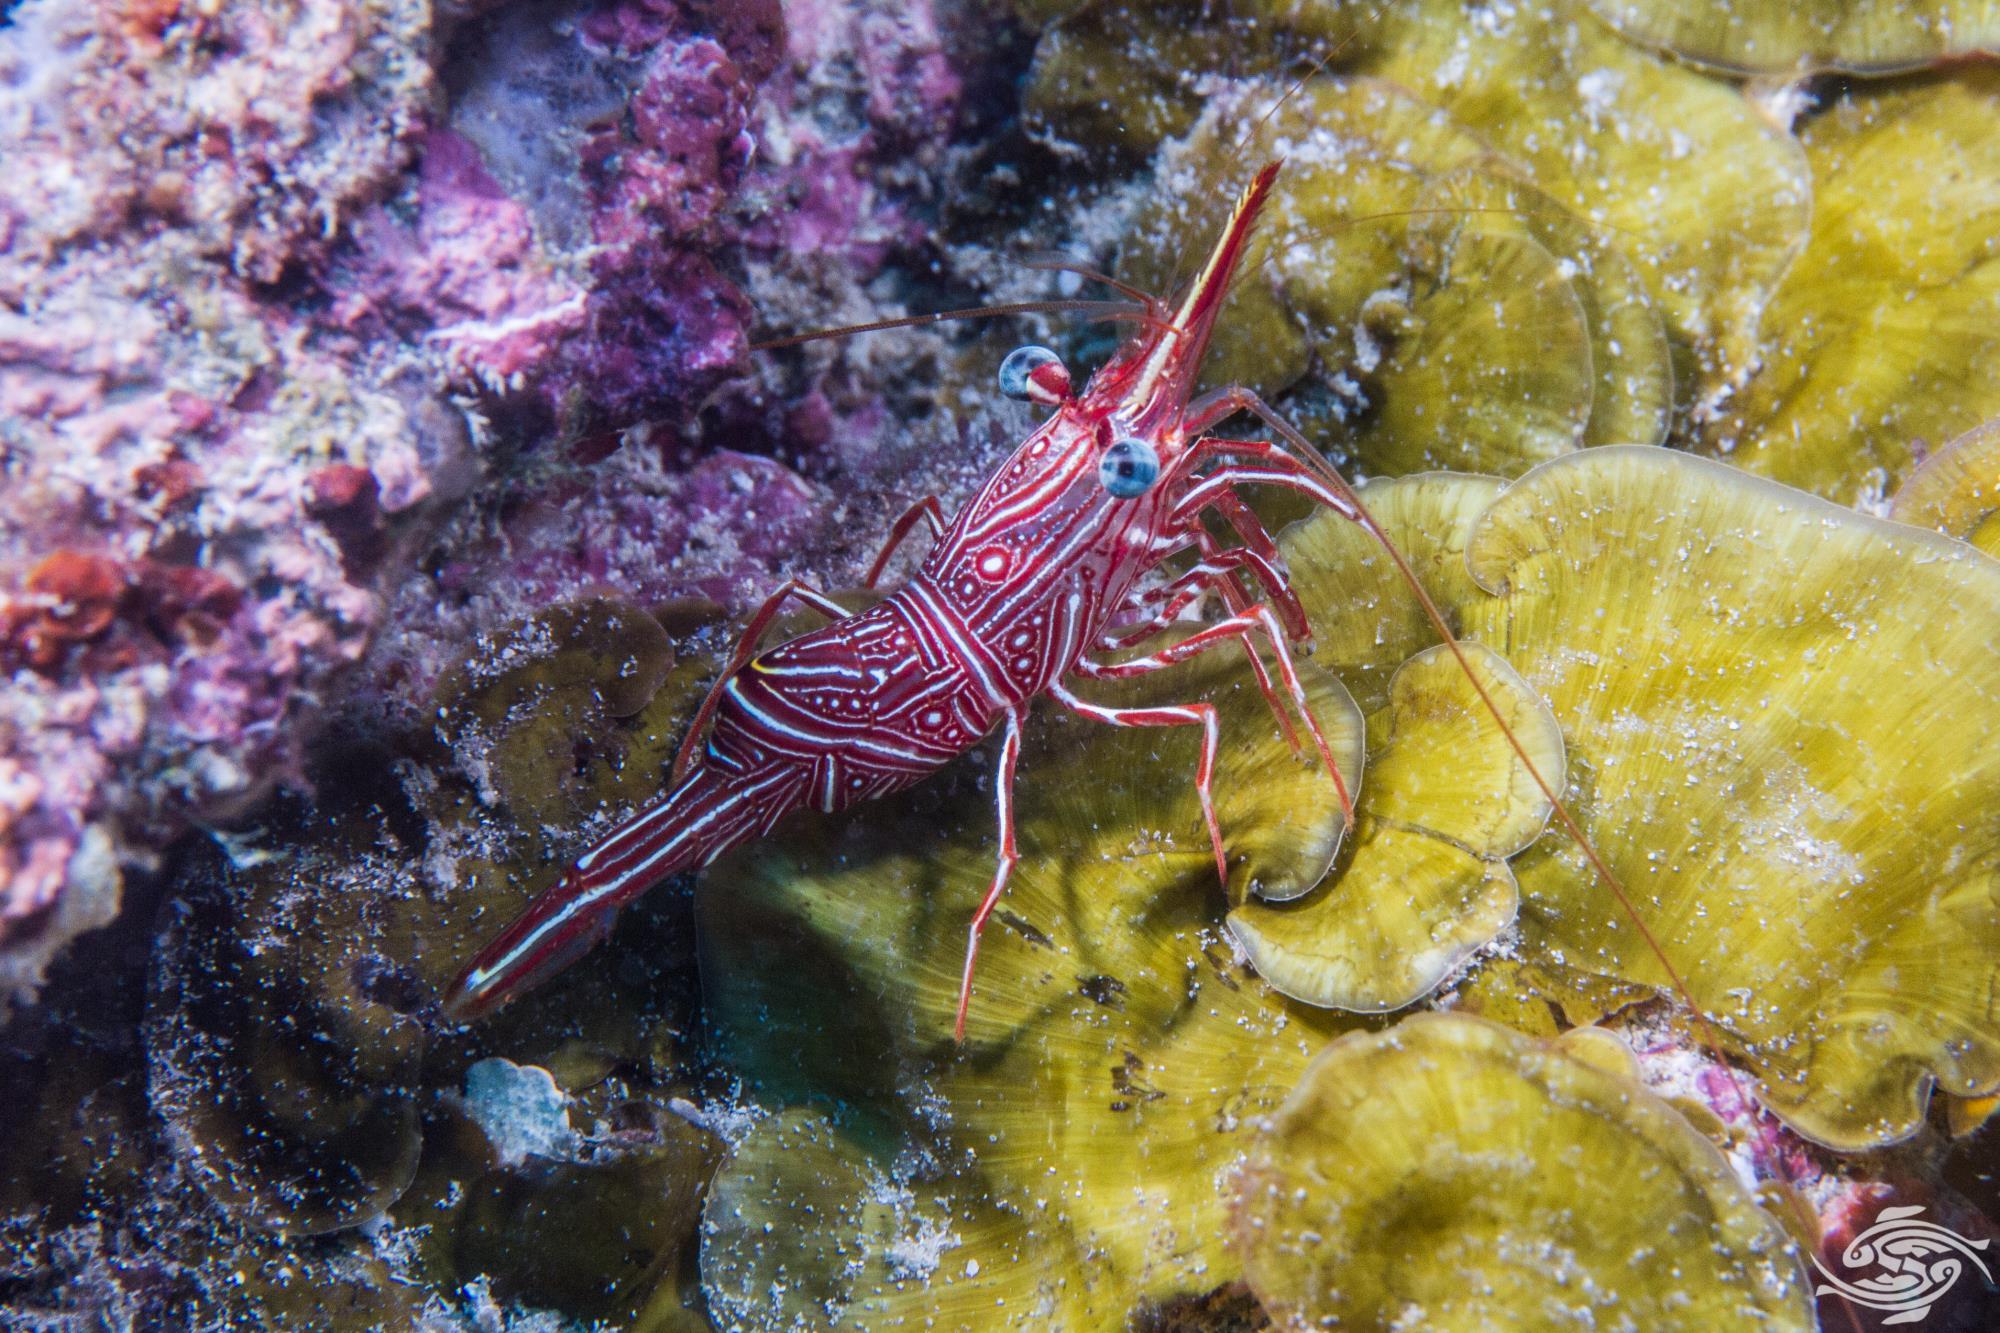 Durban Dancing Shrimp - Rhynchocinetes durbanensis